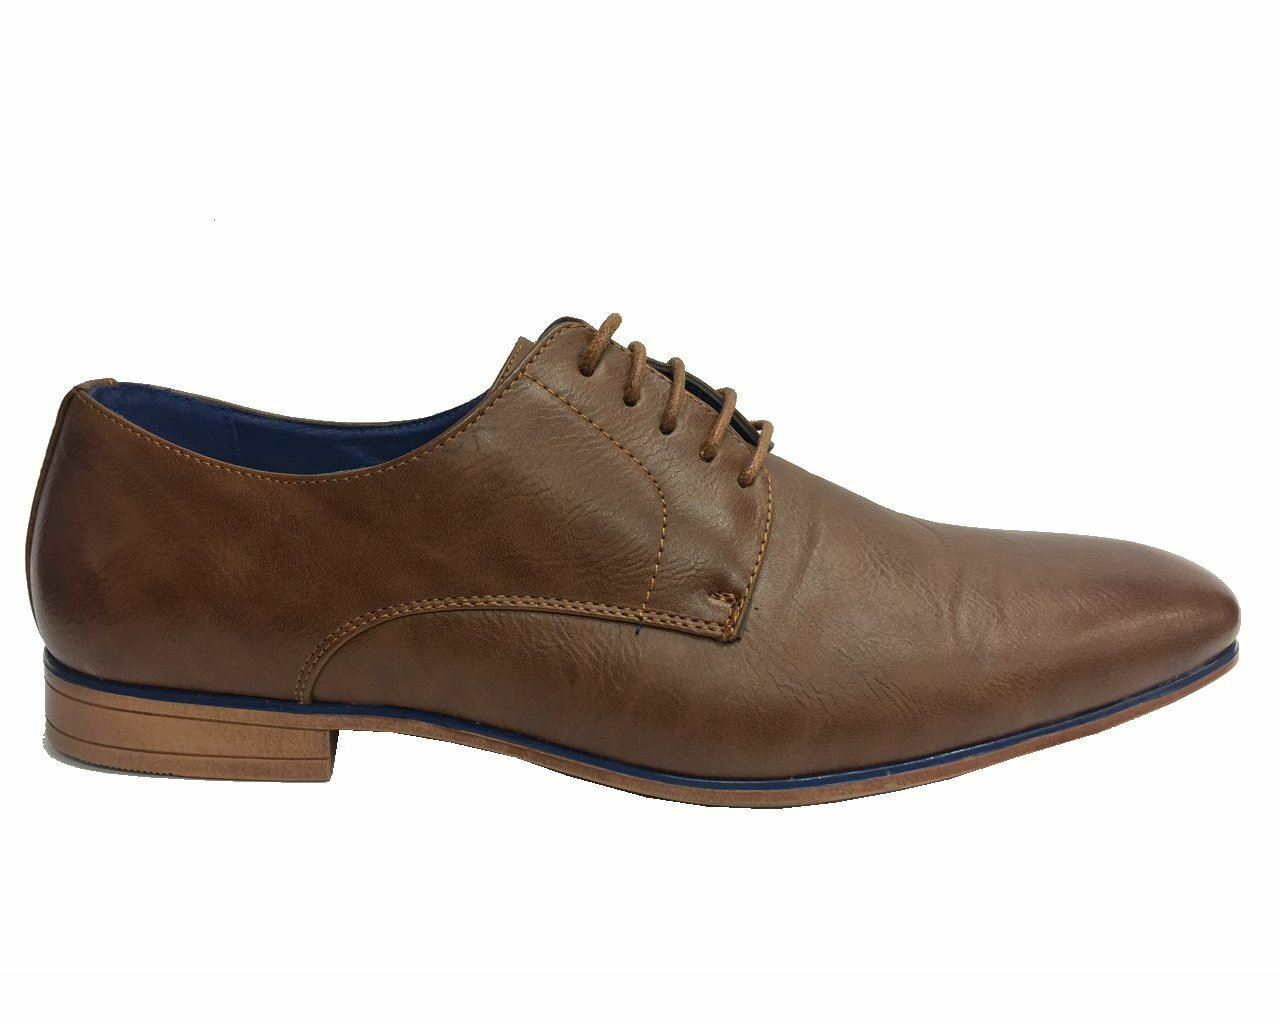 Mens Fashion A116 Faux Leather shoes Formal Smart Dress shoes Brown